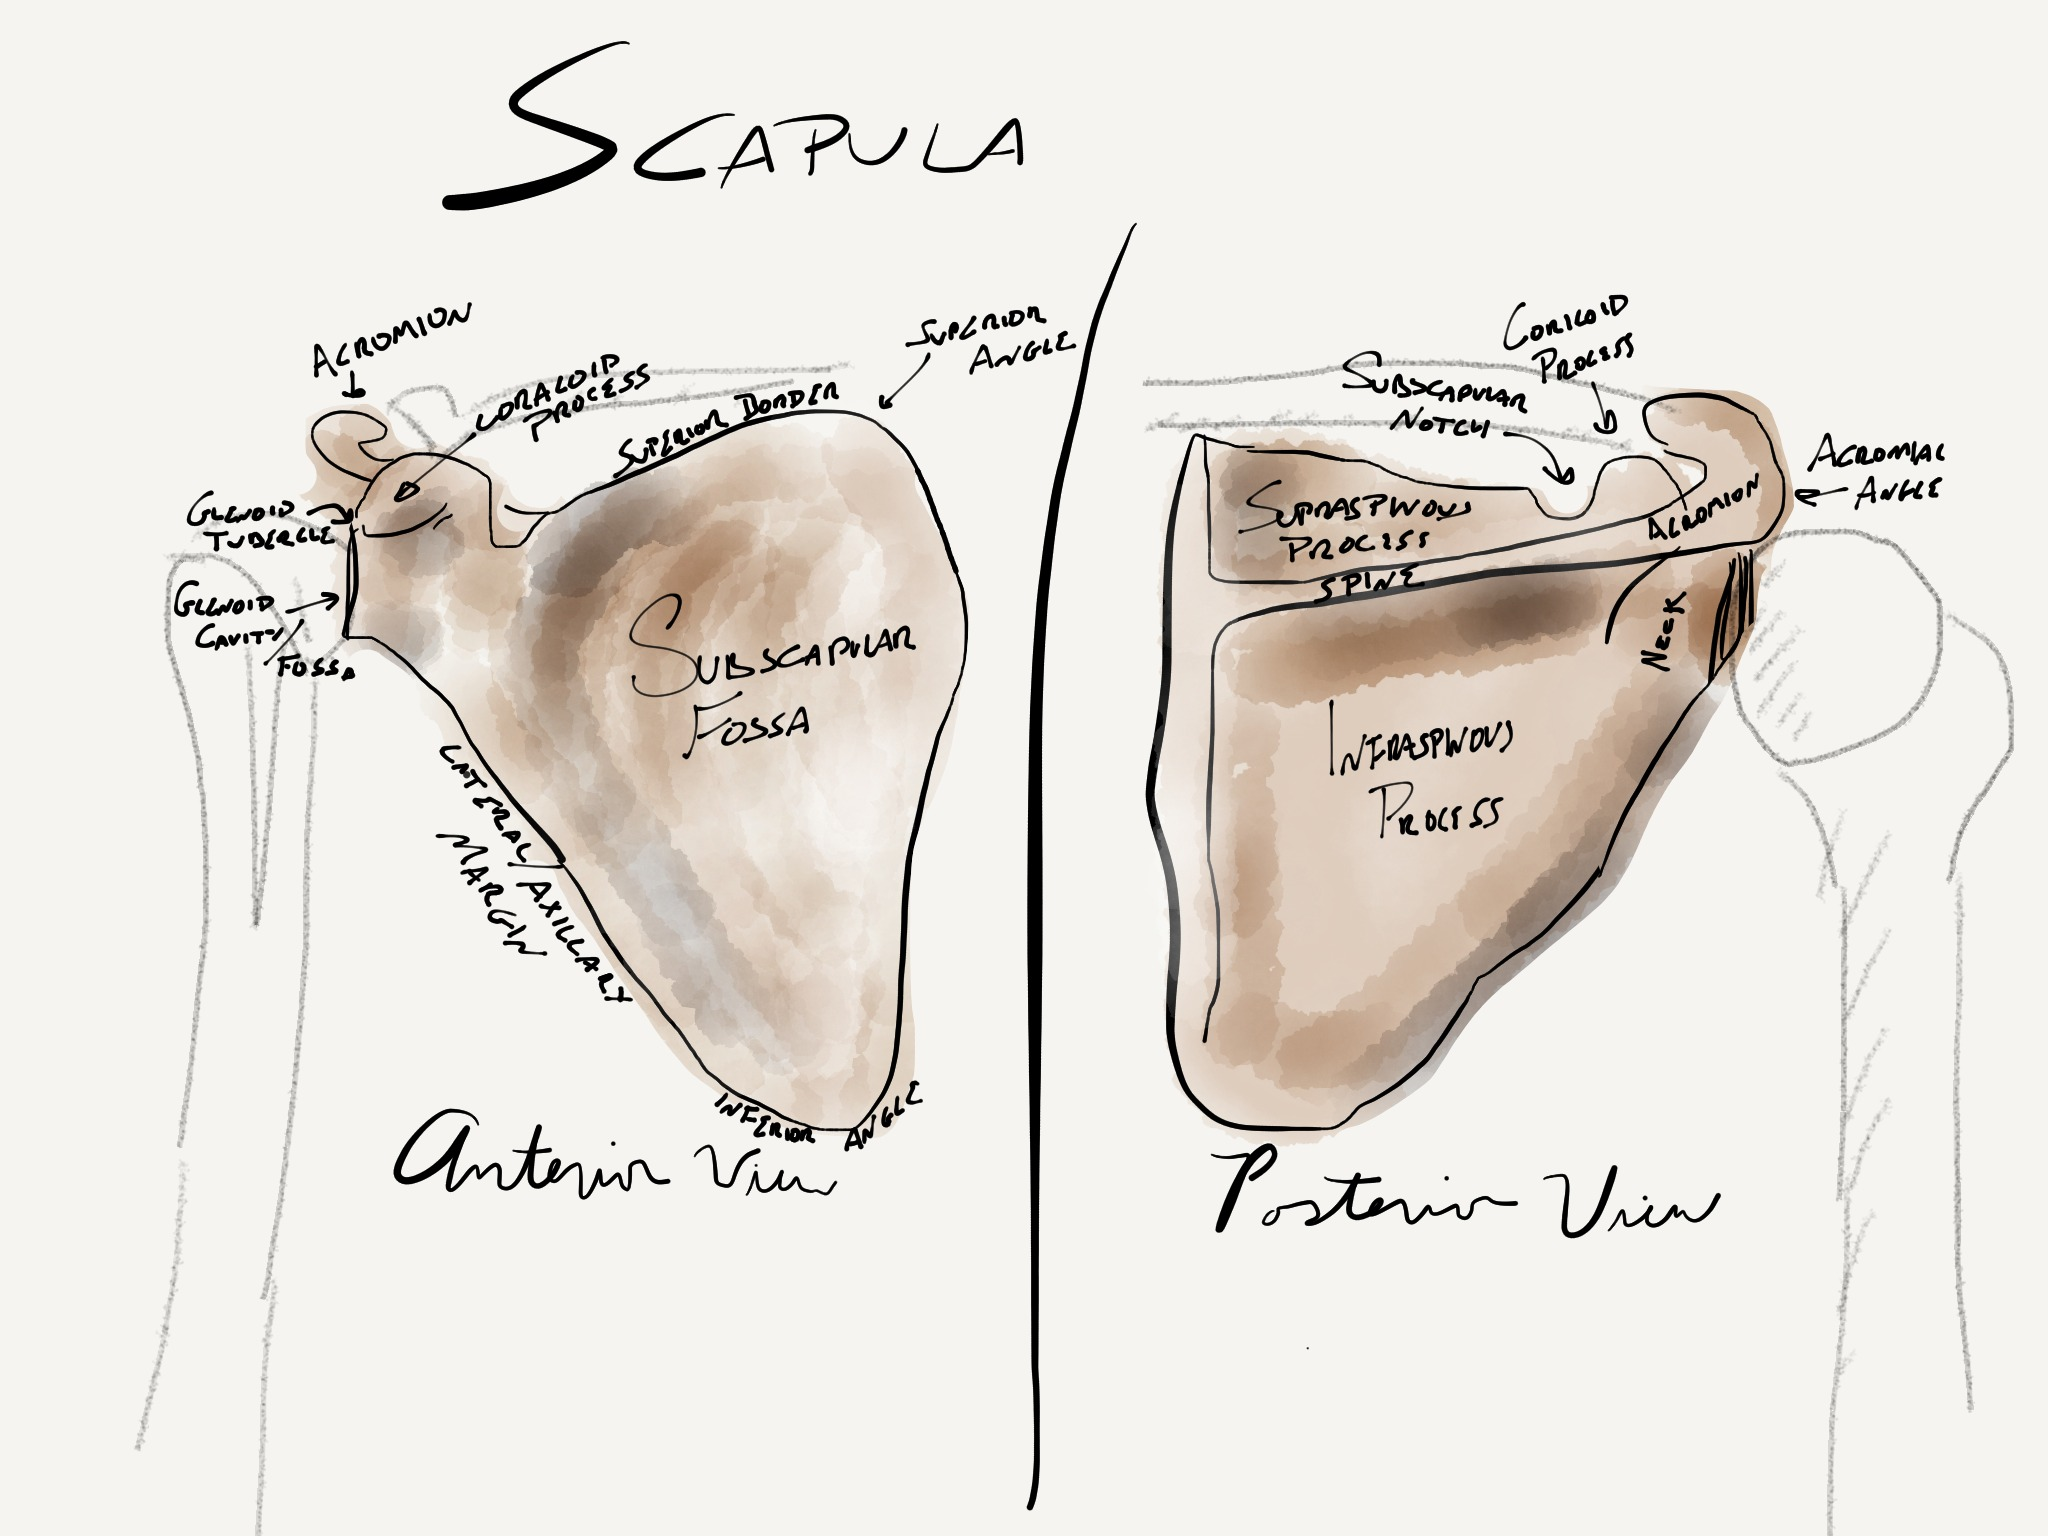 The Scapula